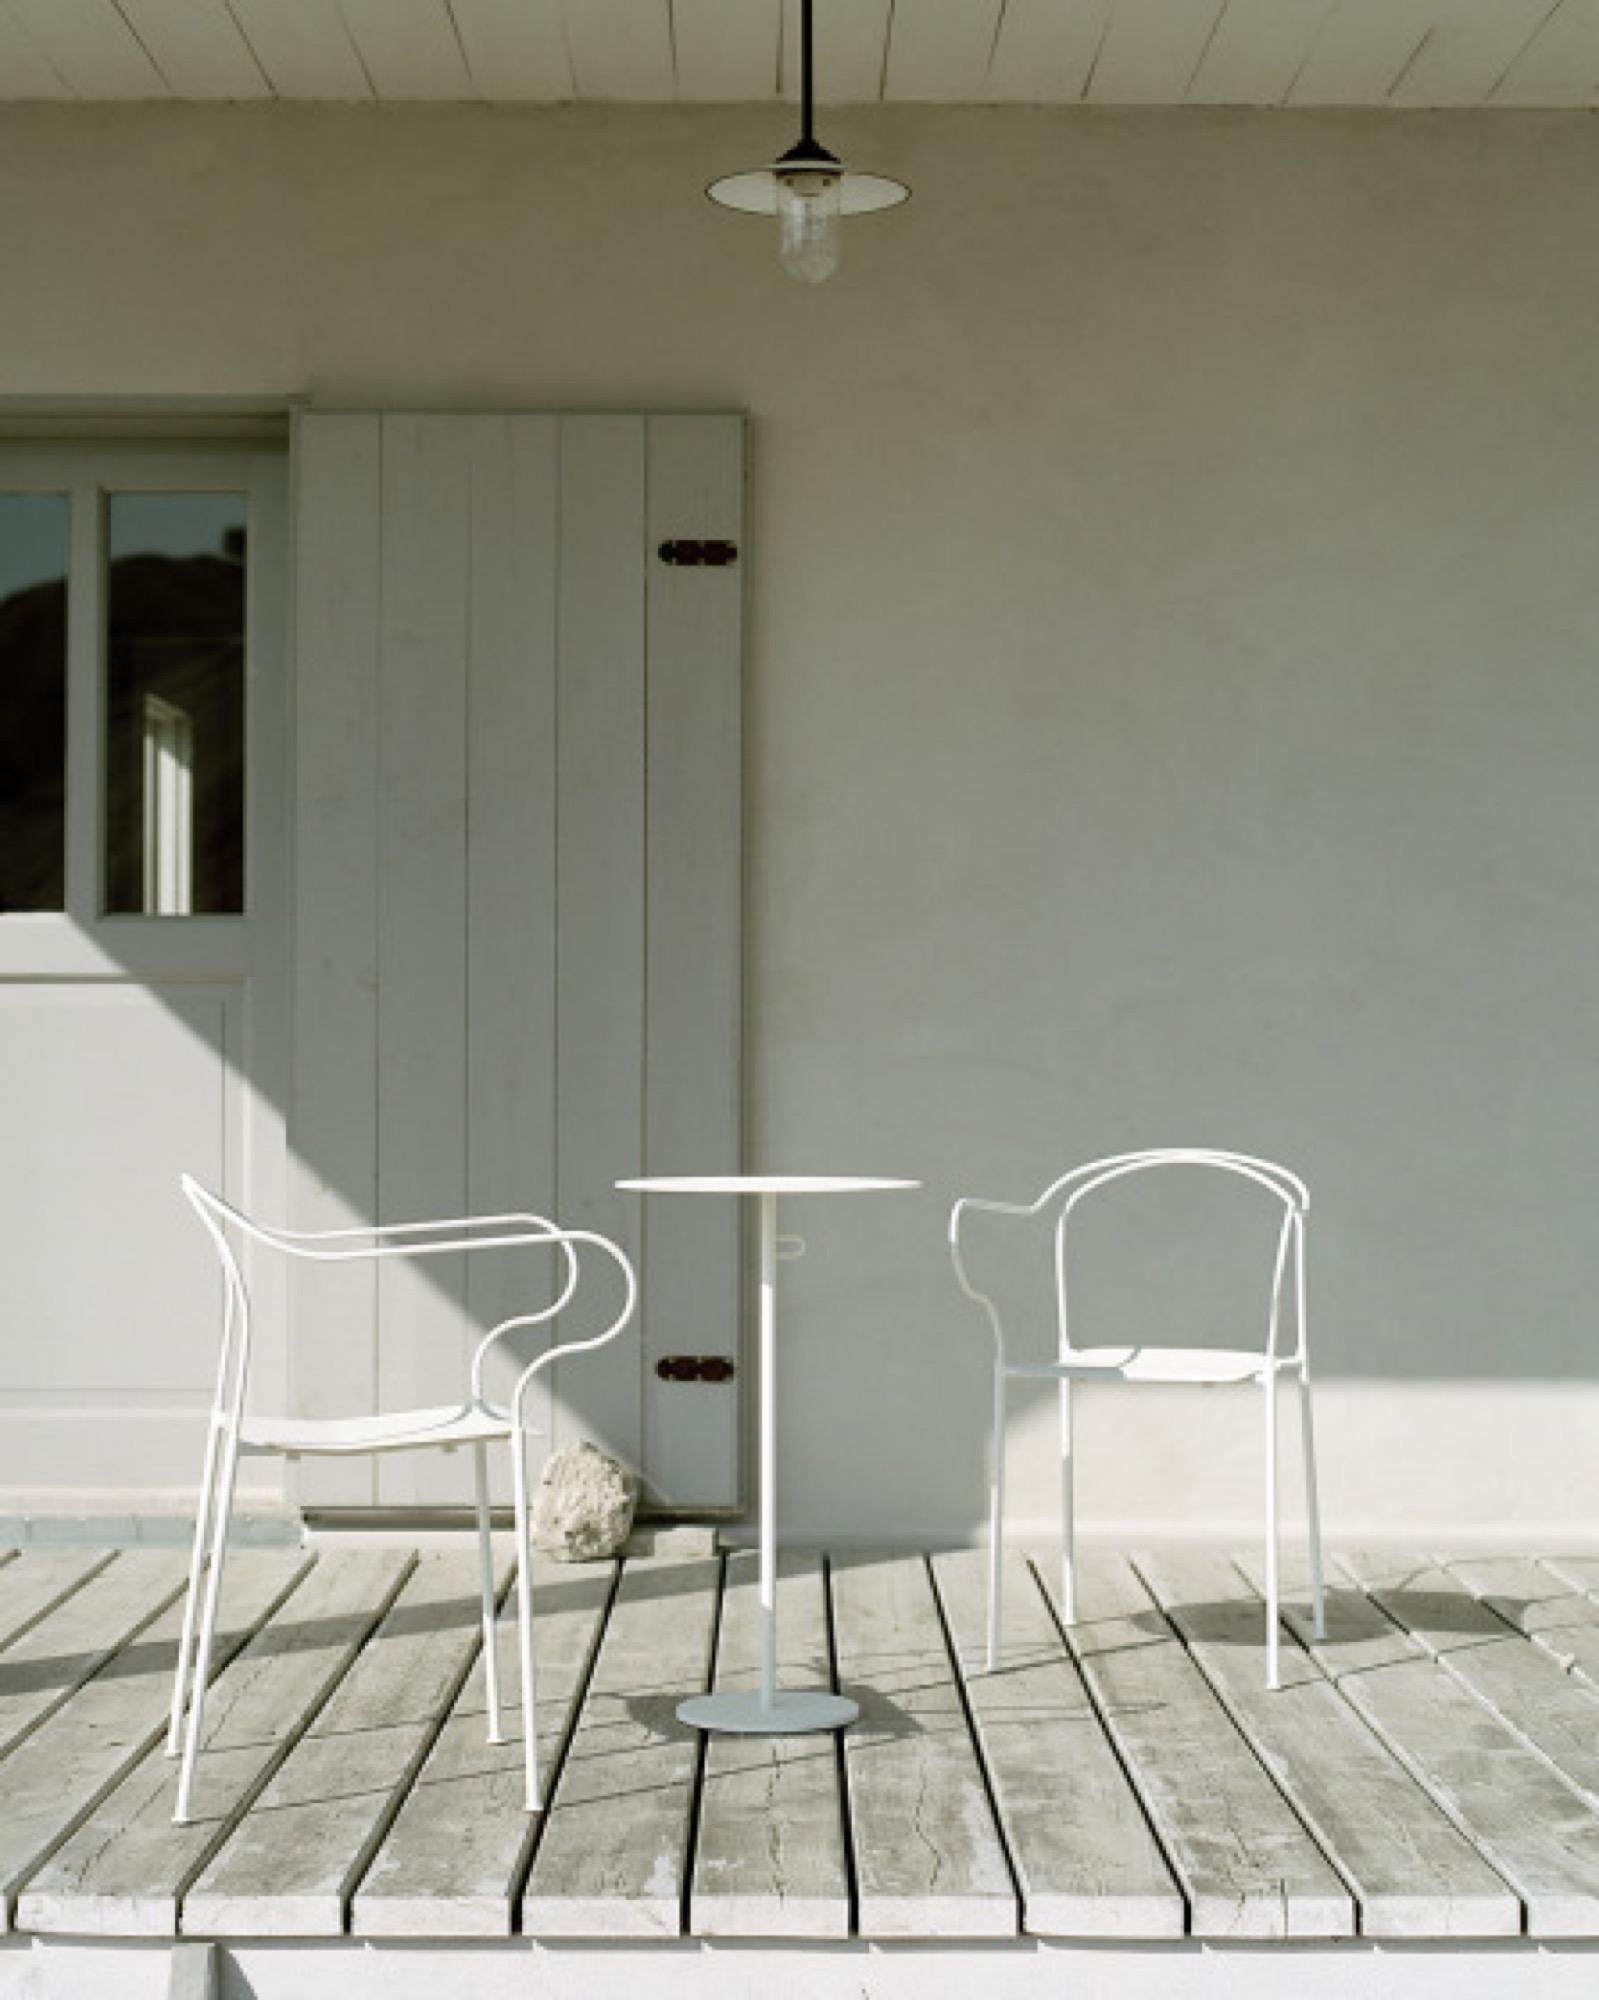 patric-johansson-198